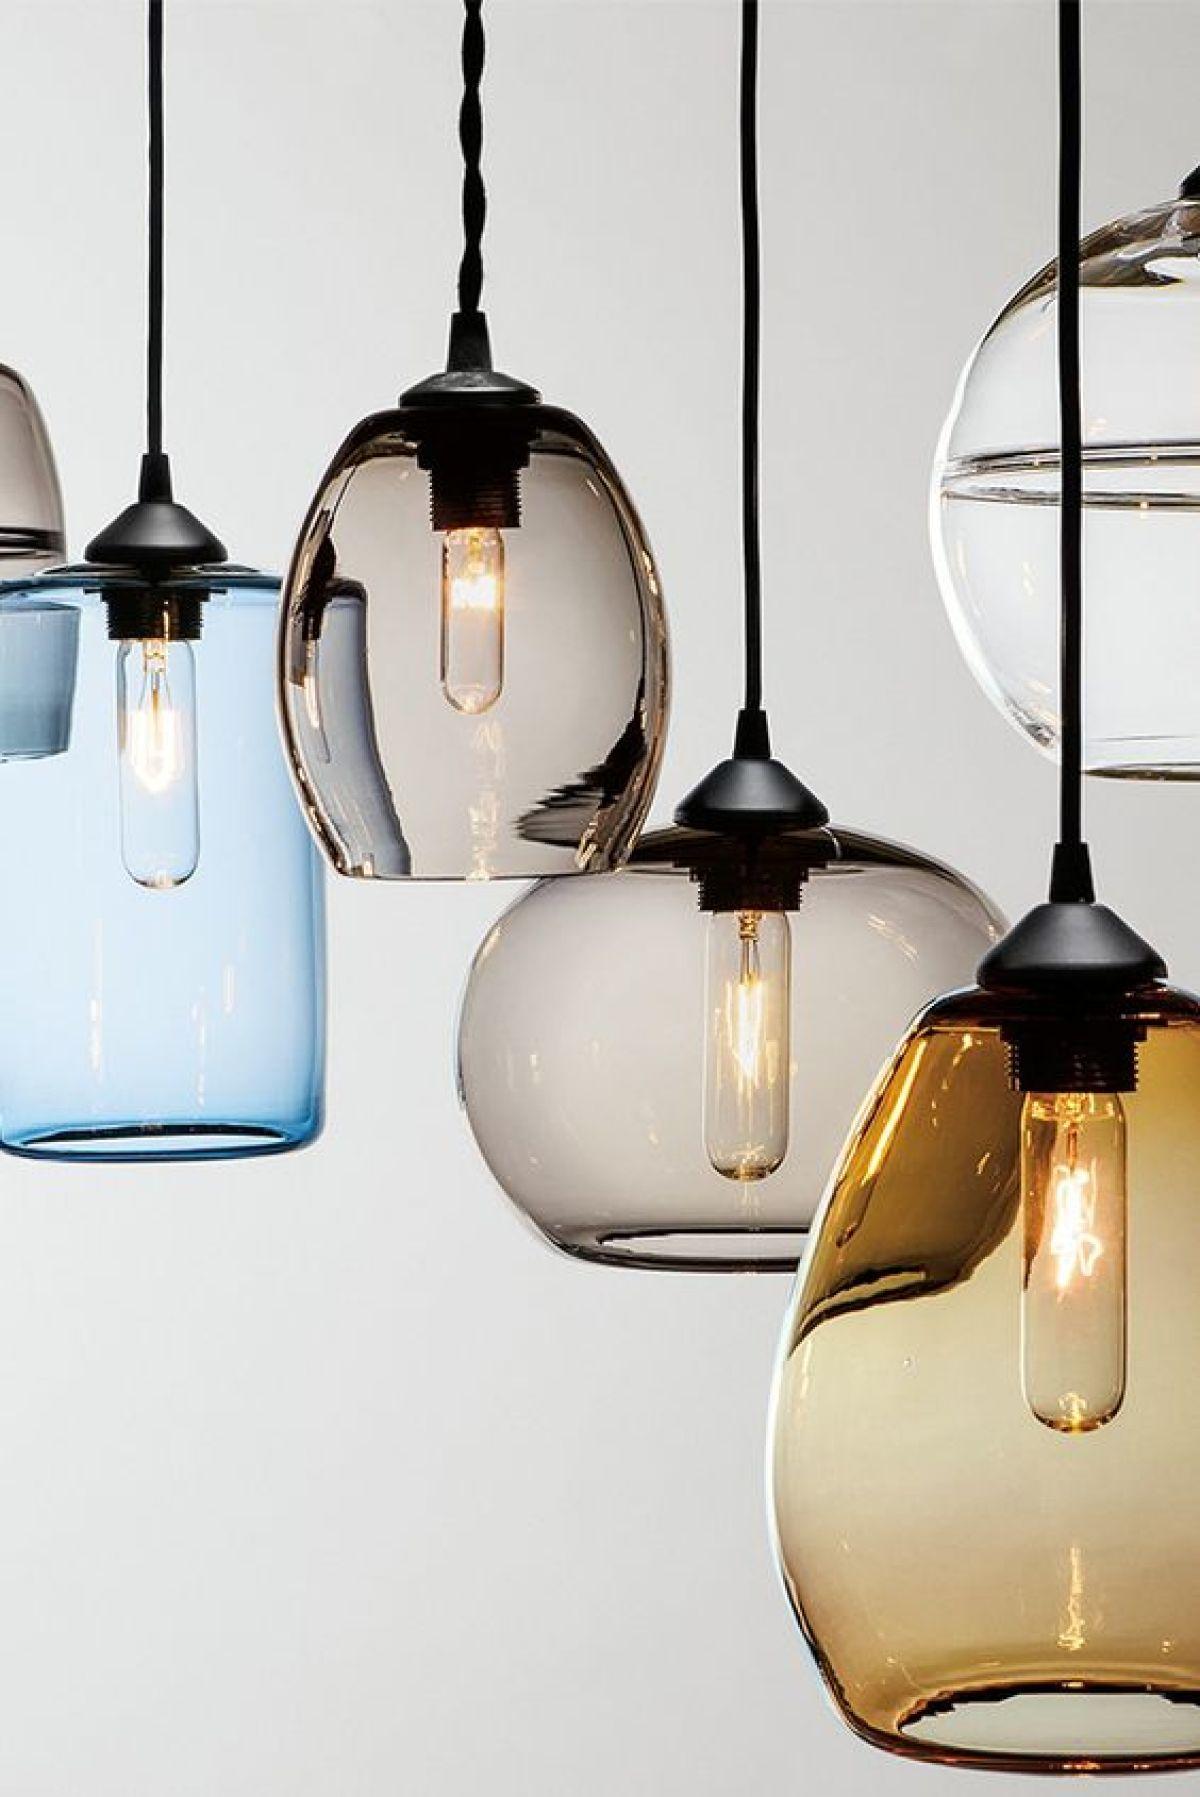 Lampadario Con Punto Luce Decentrato sp interior design   lampade a sospensione low cost